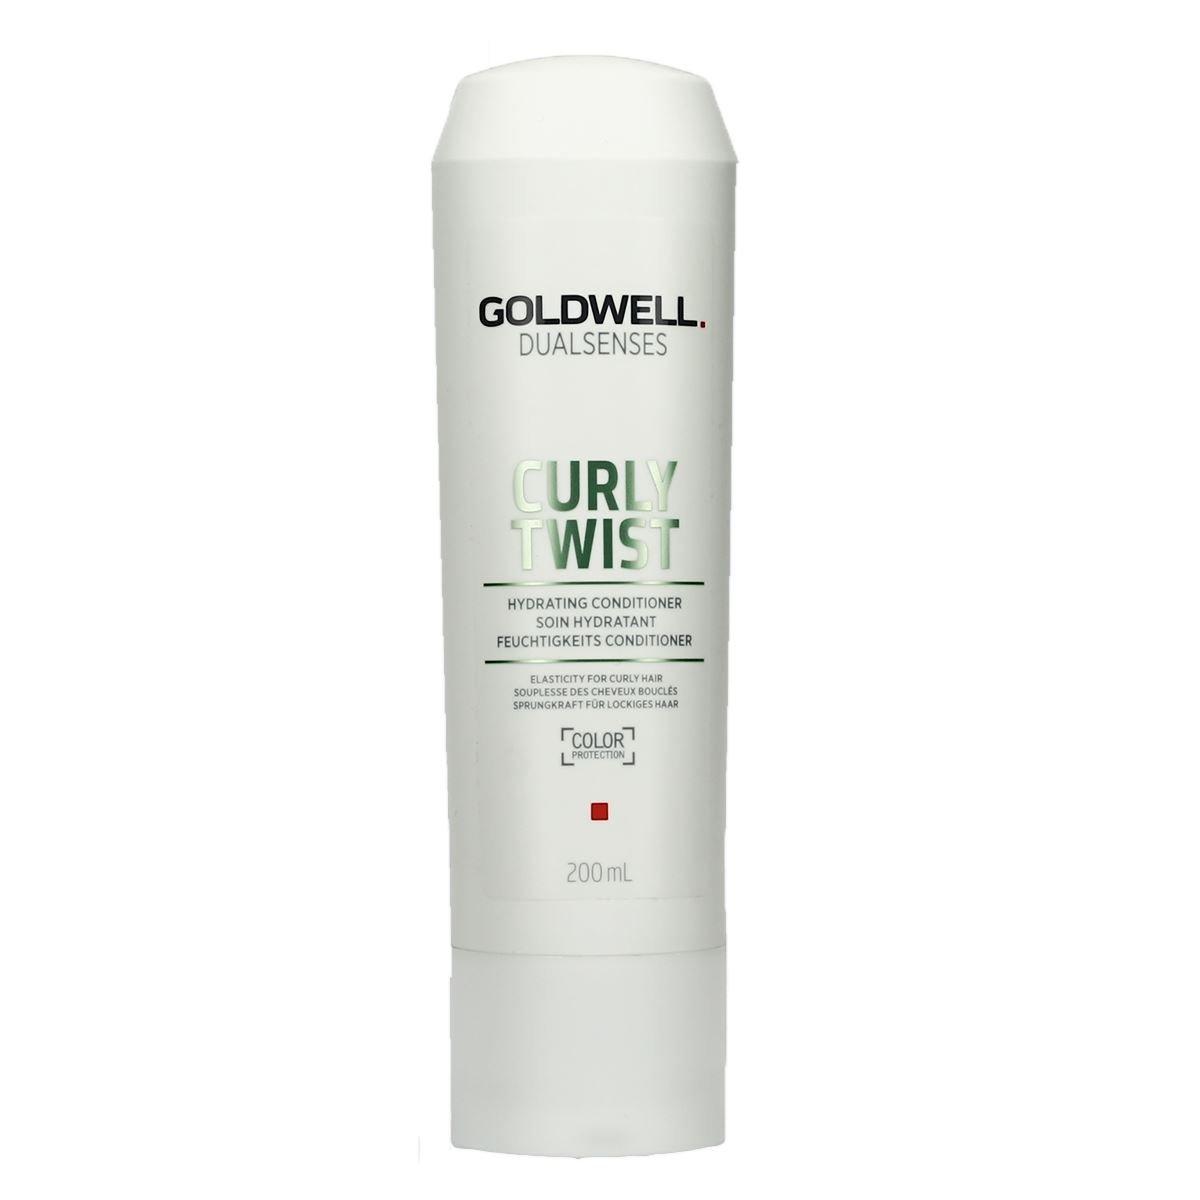 Goldwell Dualsenses Curly Twist Hydrating condizionatore, 1er Pack (1X 200ML) 4021609061564